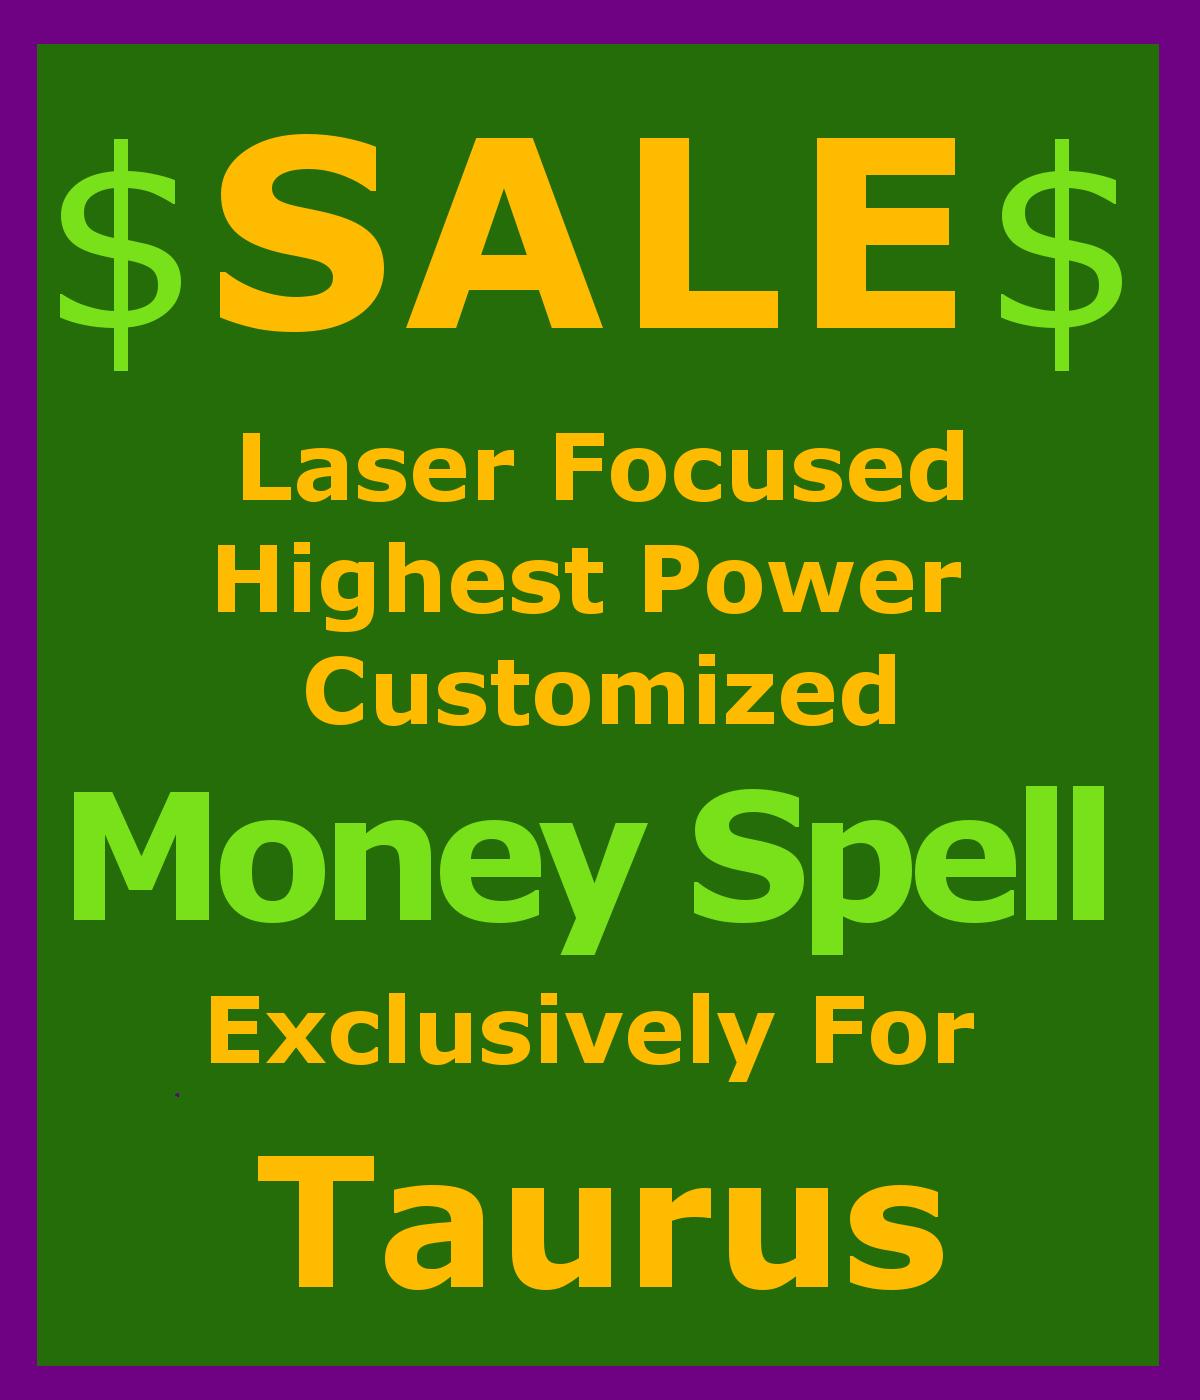 Taurusmoney